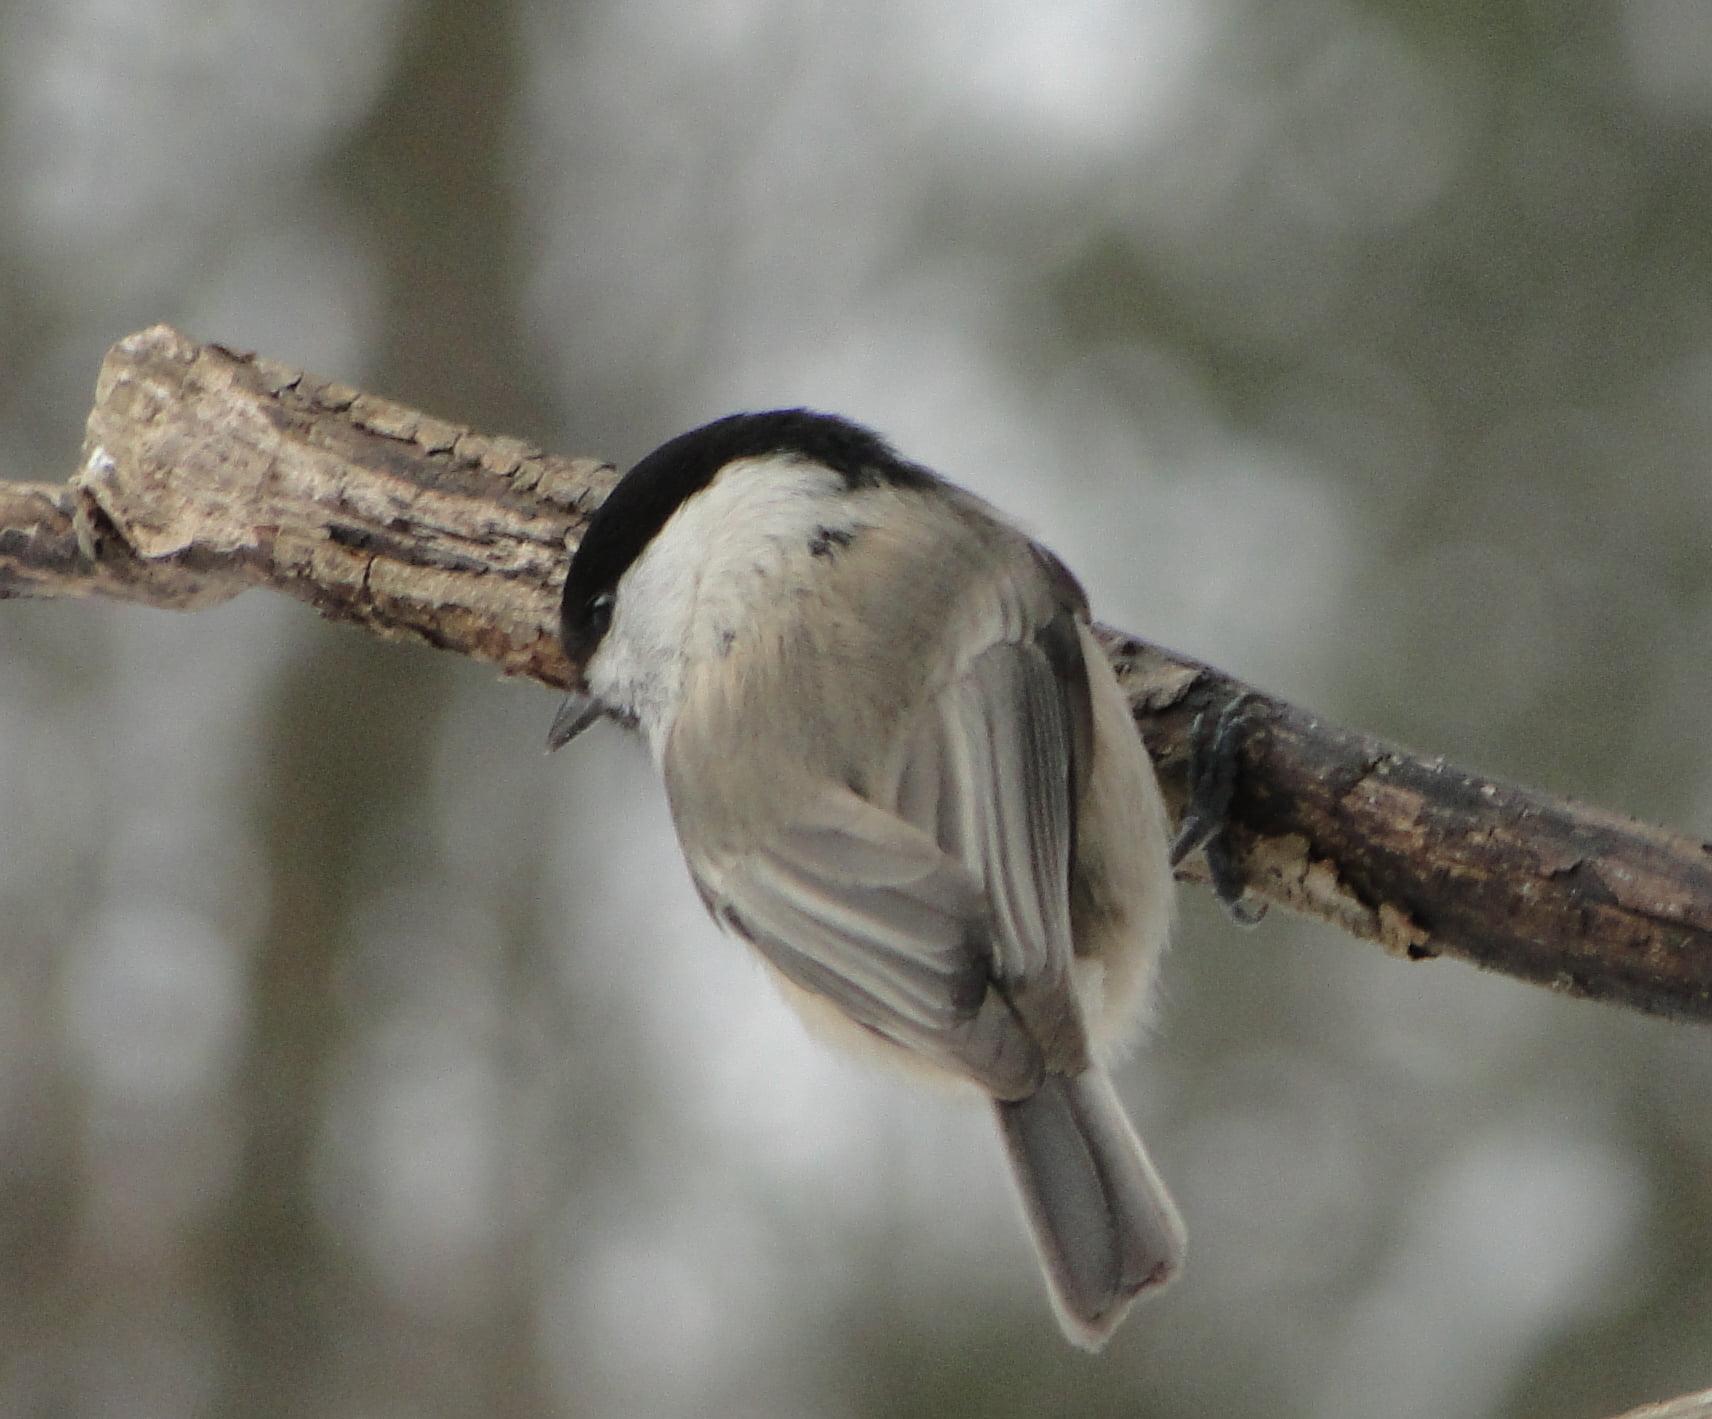 Nasi zimowi ptasi przyjaciele 1